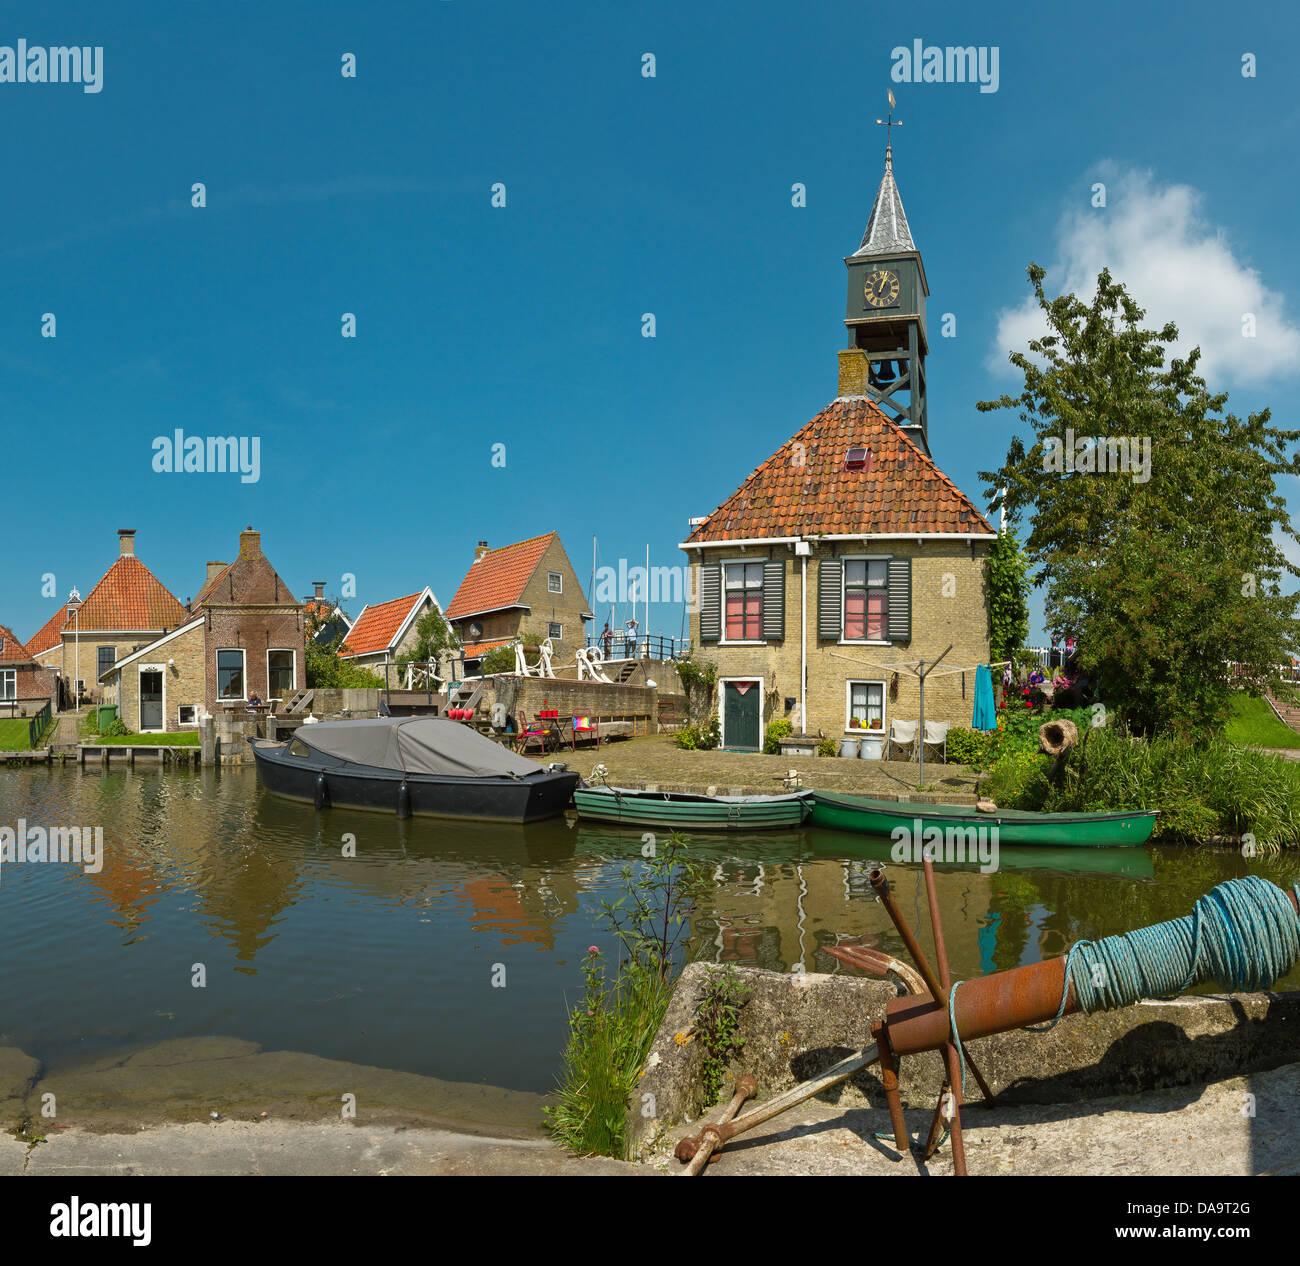 Netherlands, Holland, Europe, Hindeloopen, lock, house, city, village, water, summer, - Stock Image